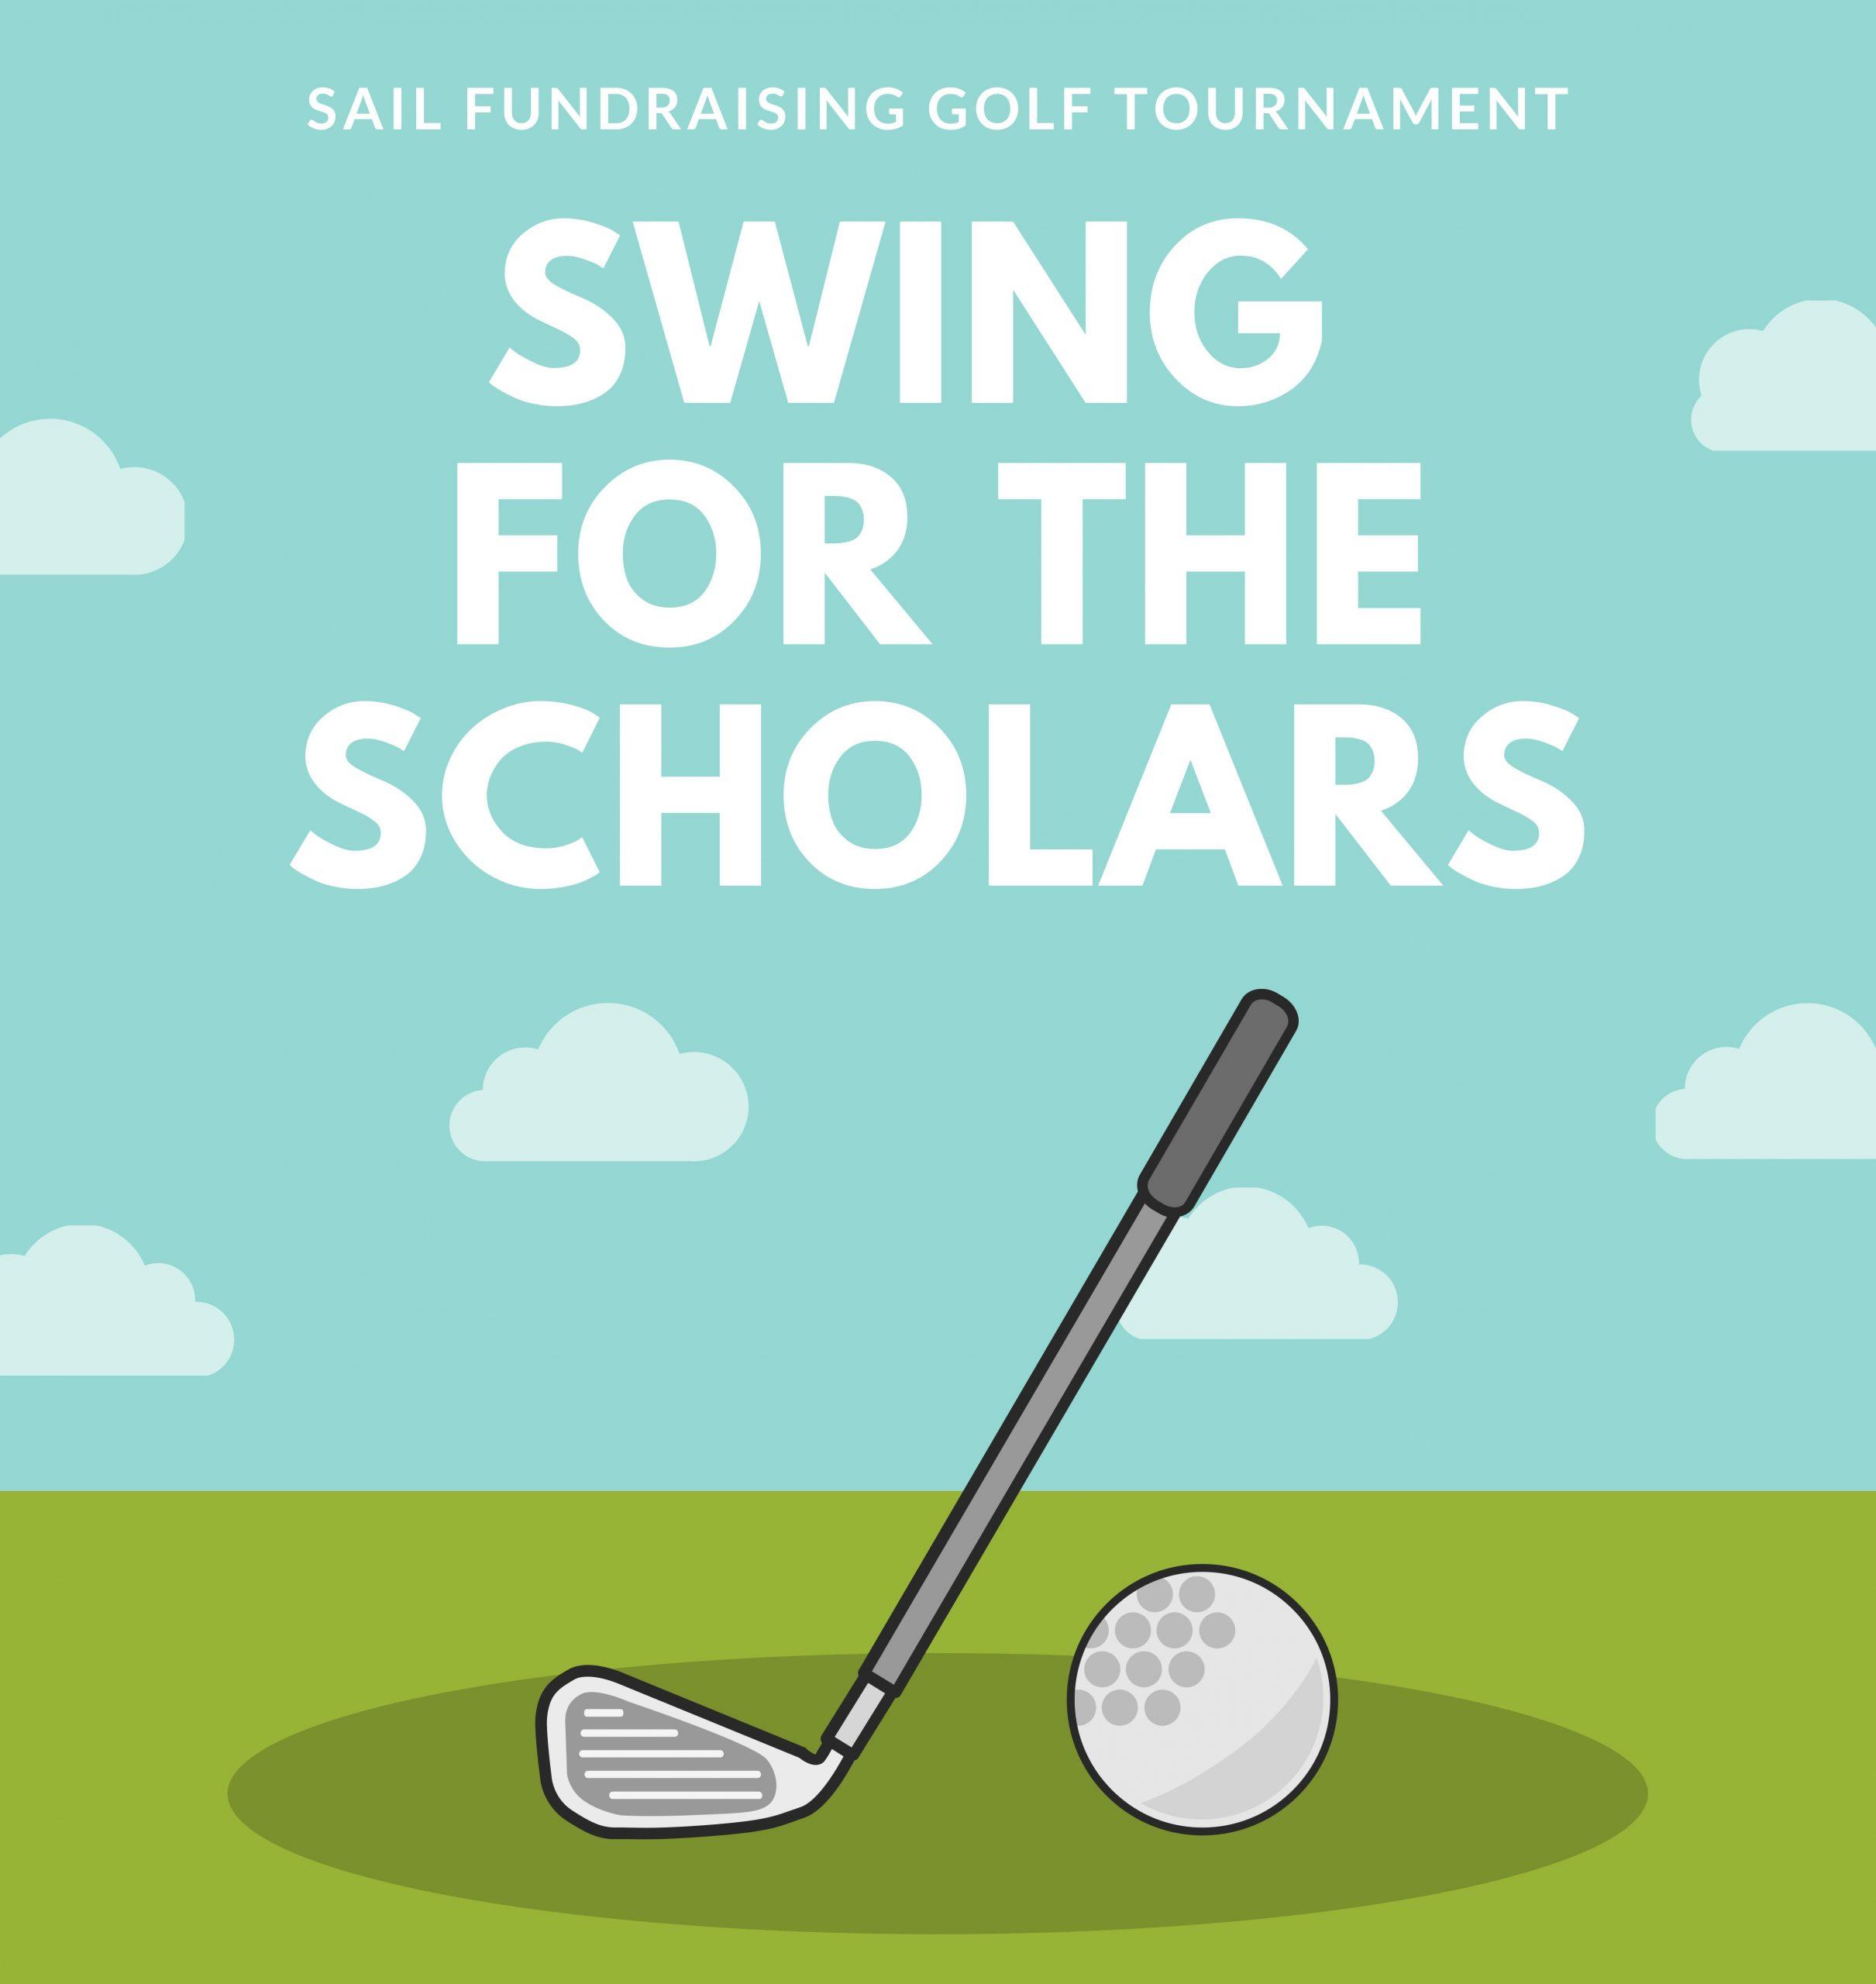 2021 SAIL Golf Tournament